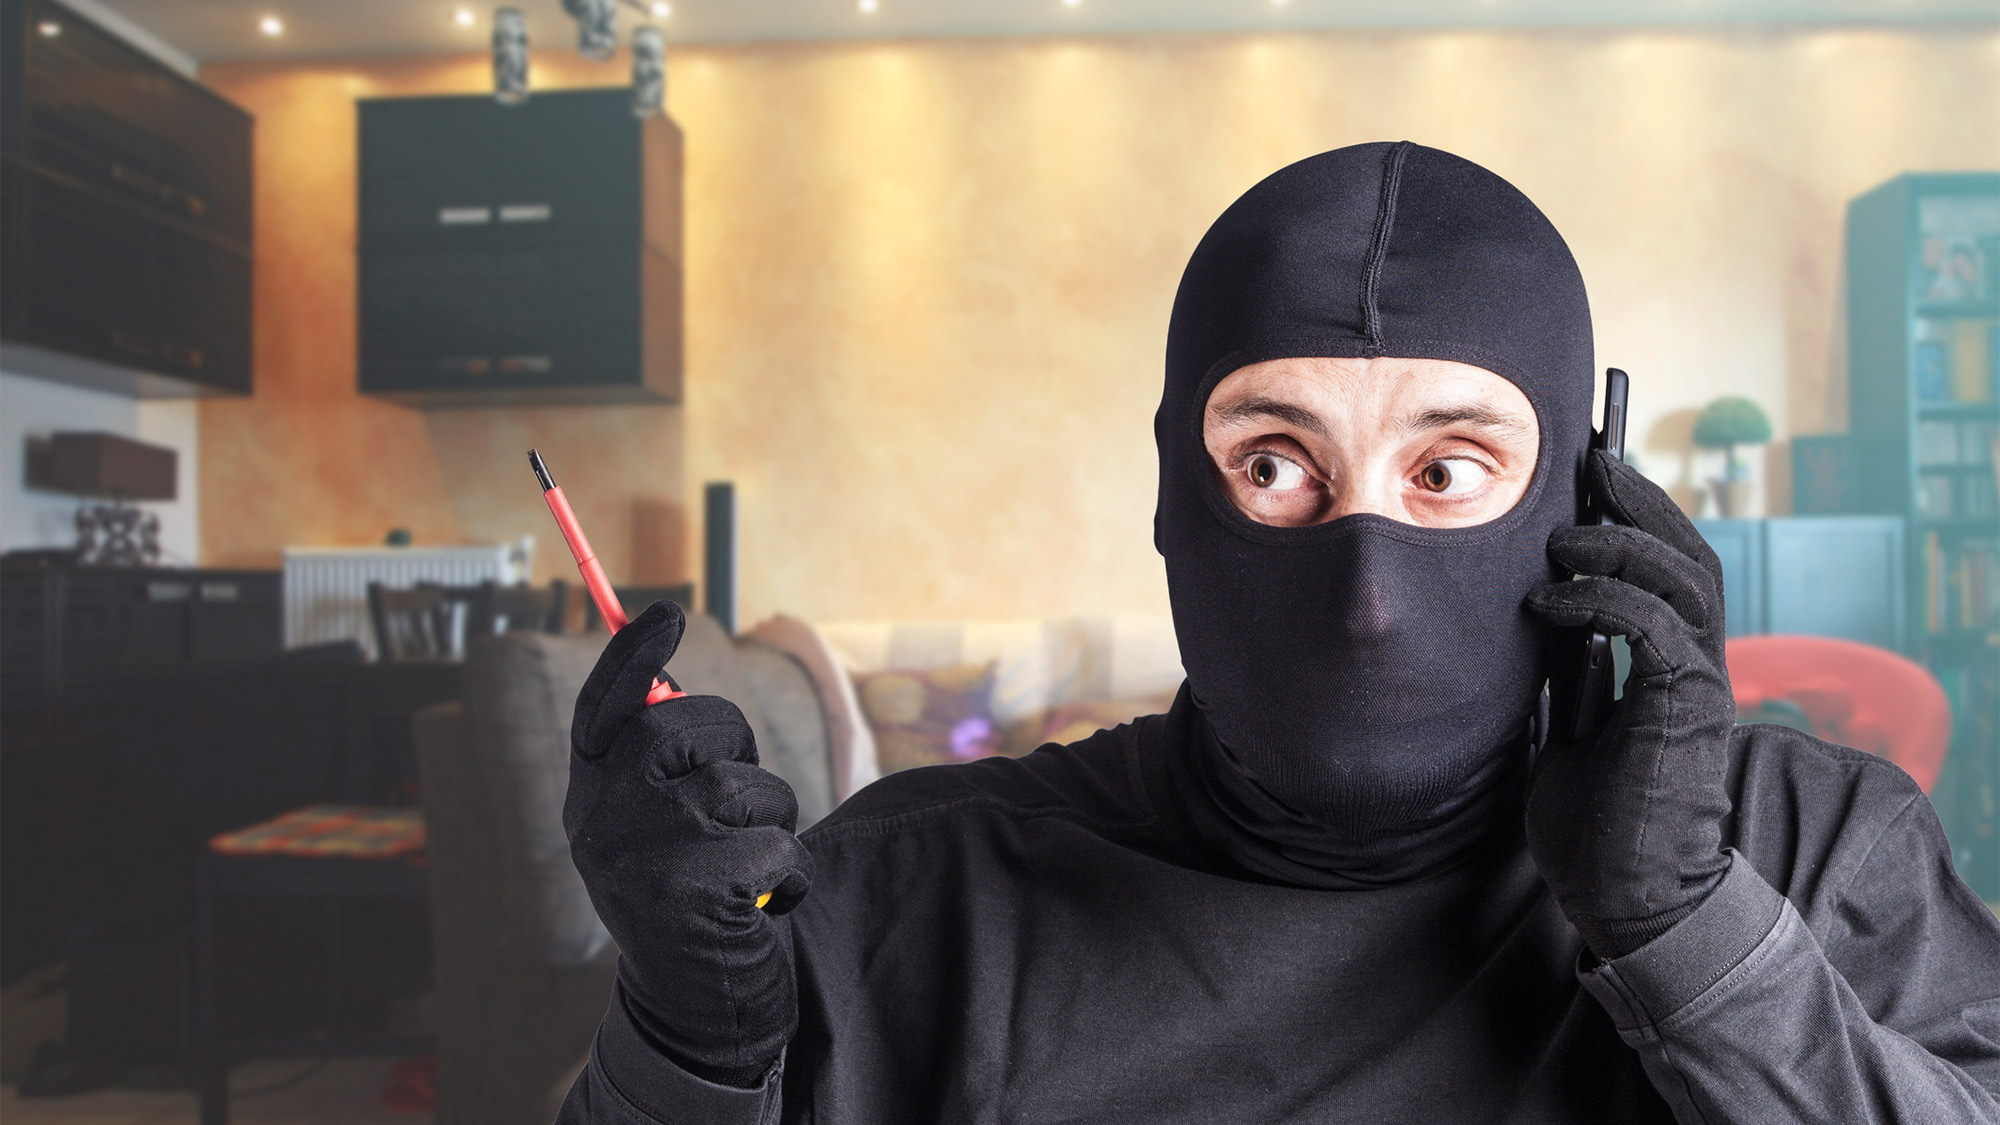 The Burglar Did What?! 5 Most Bizarre Home Break-Ins Ever